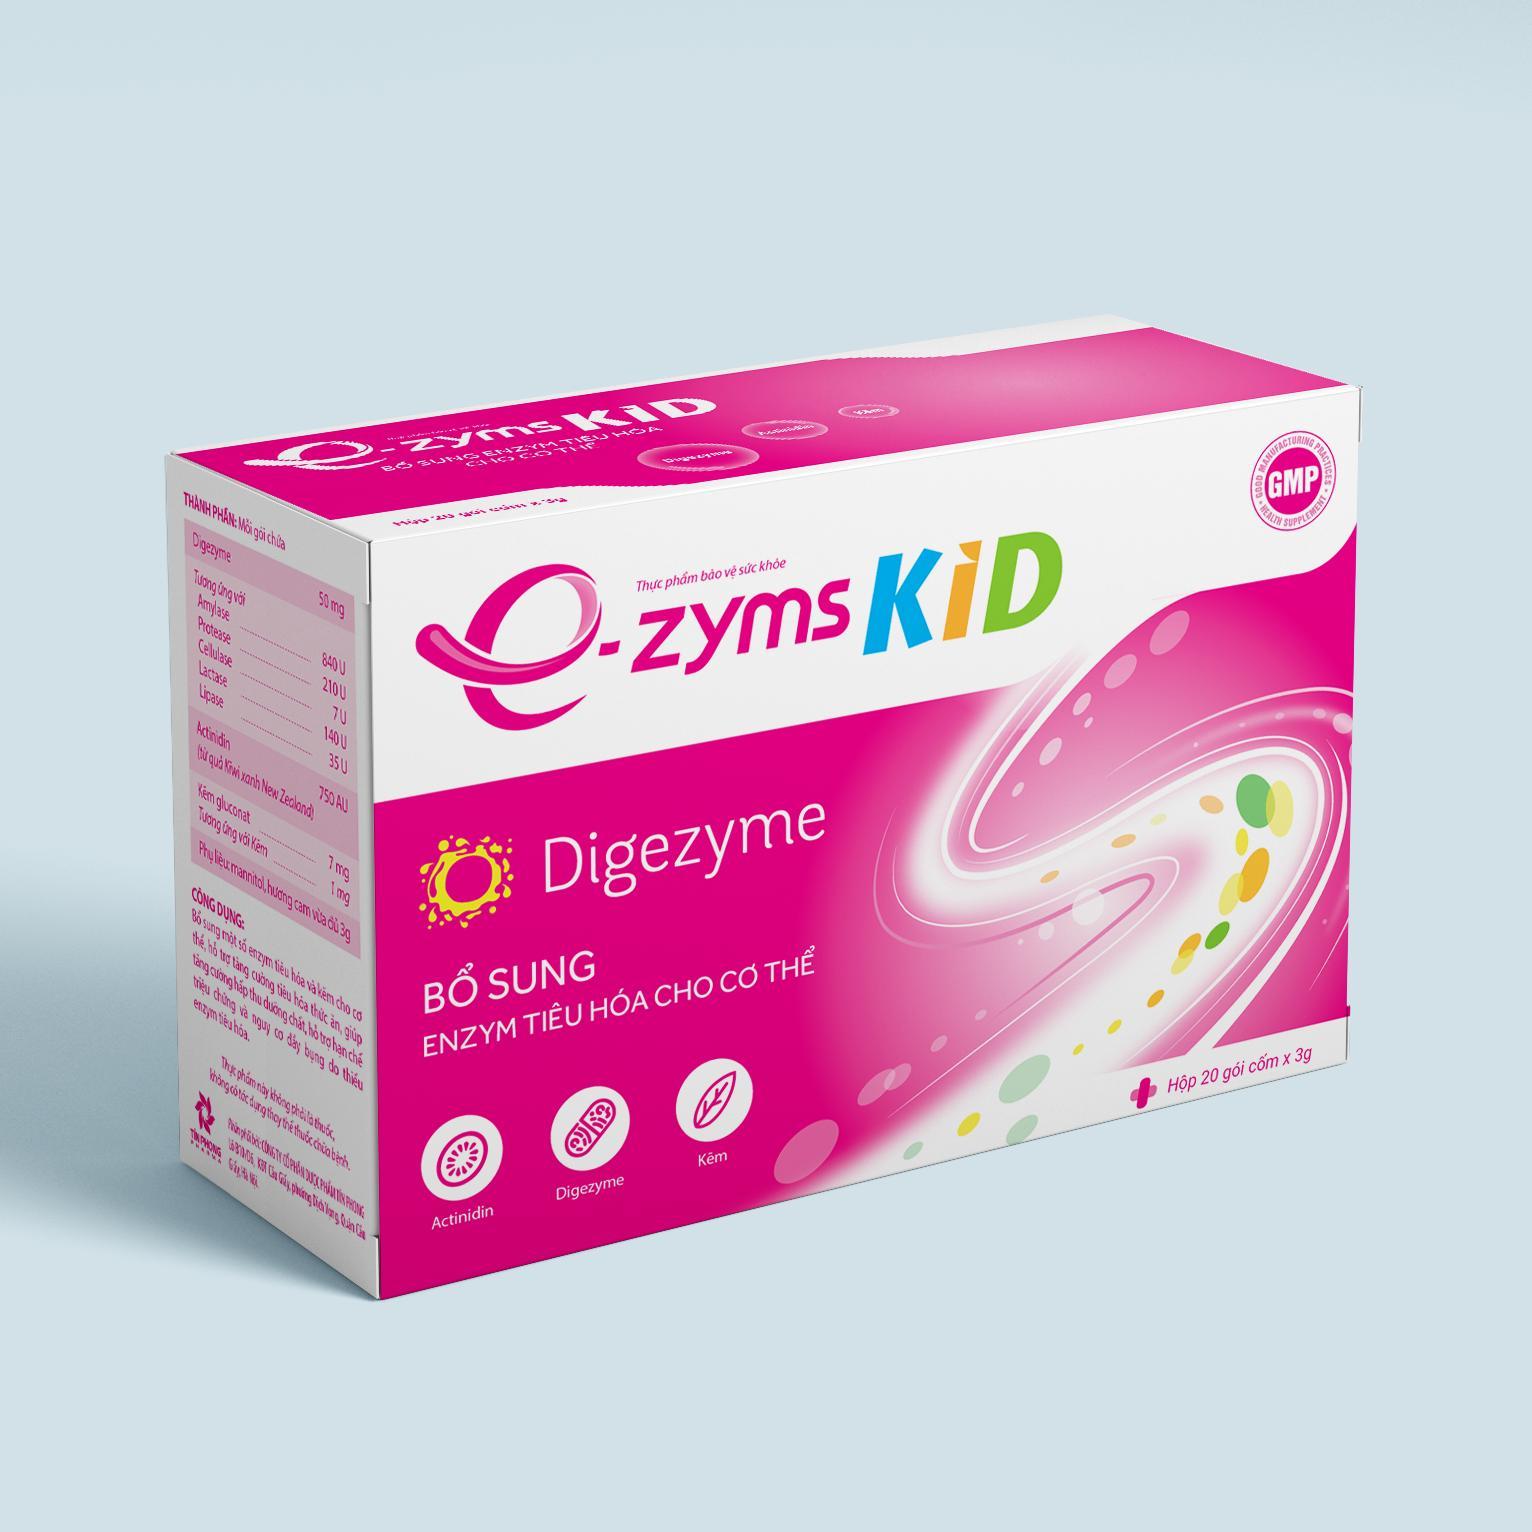 E-Zyms Kid